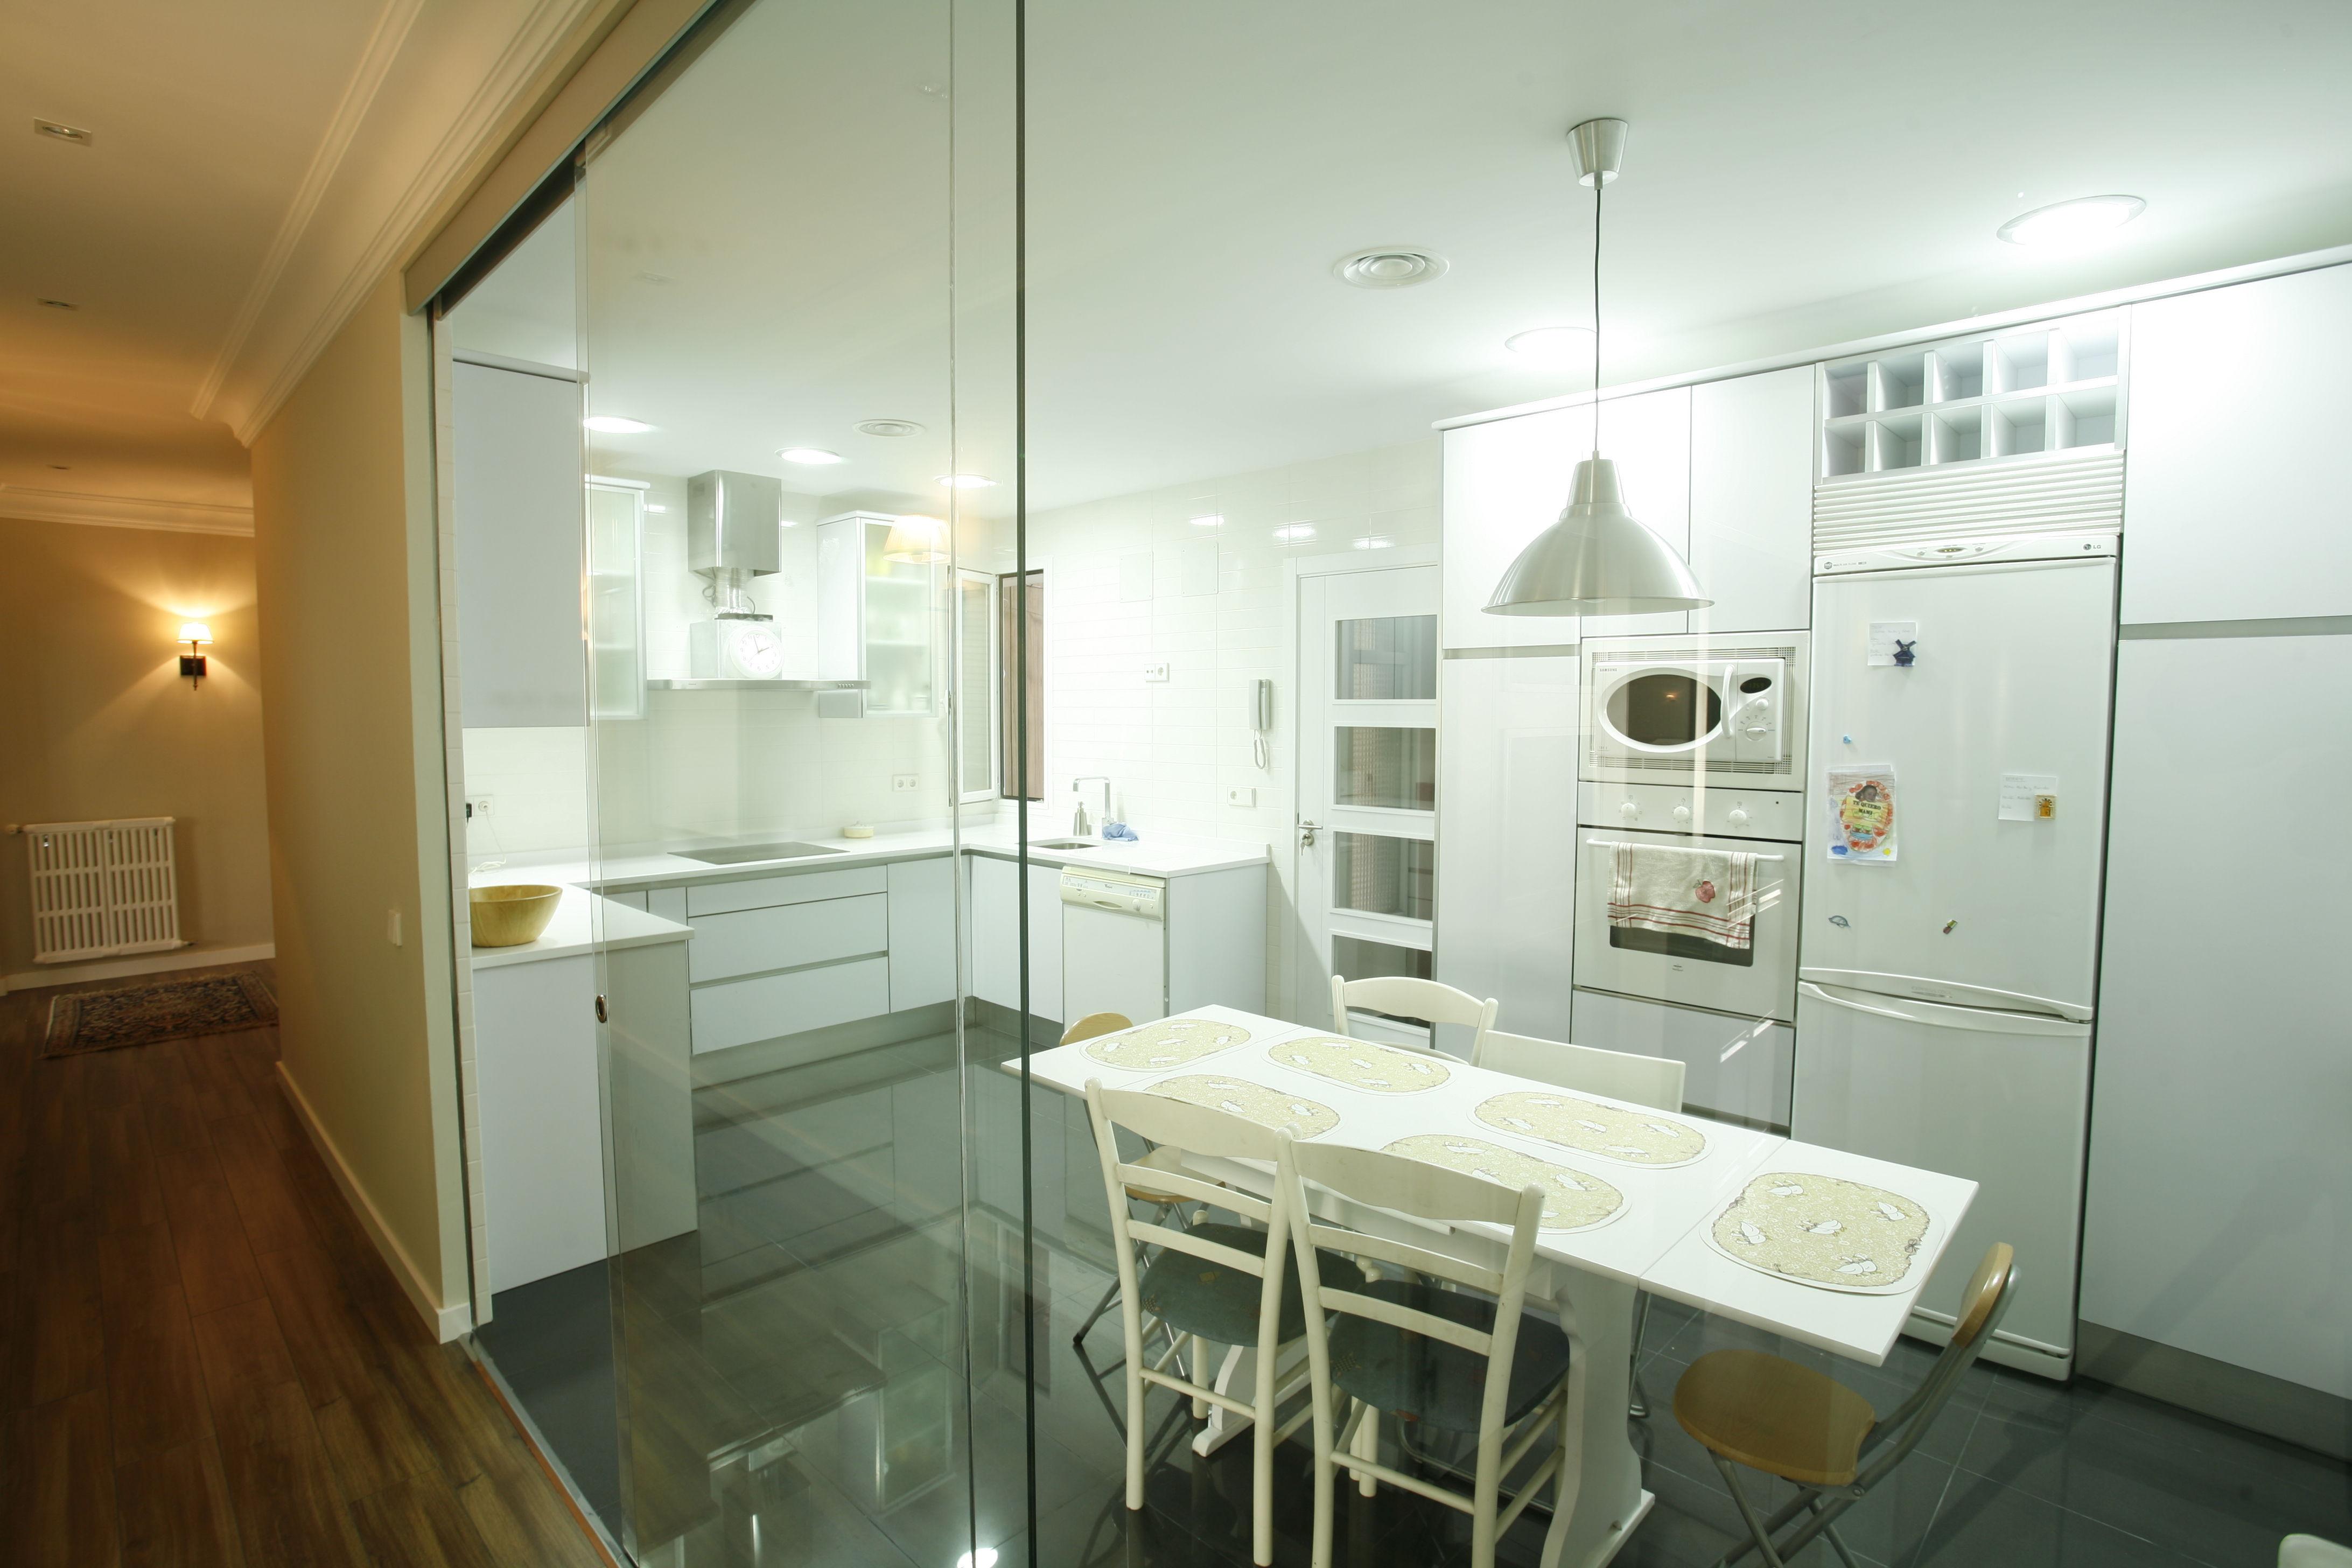 Puertas de cristal - Puerta cristal cocina ...